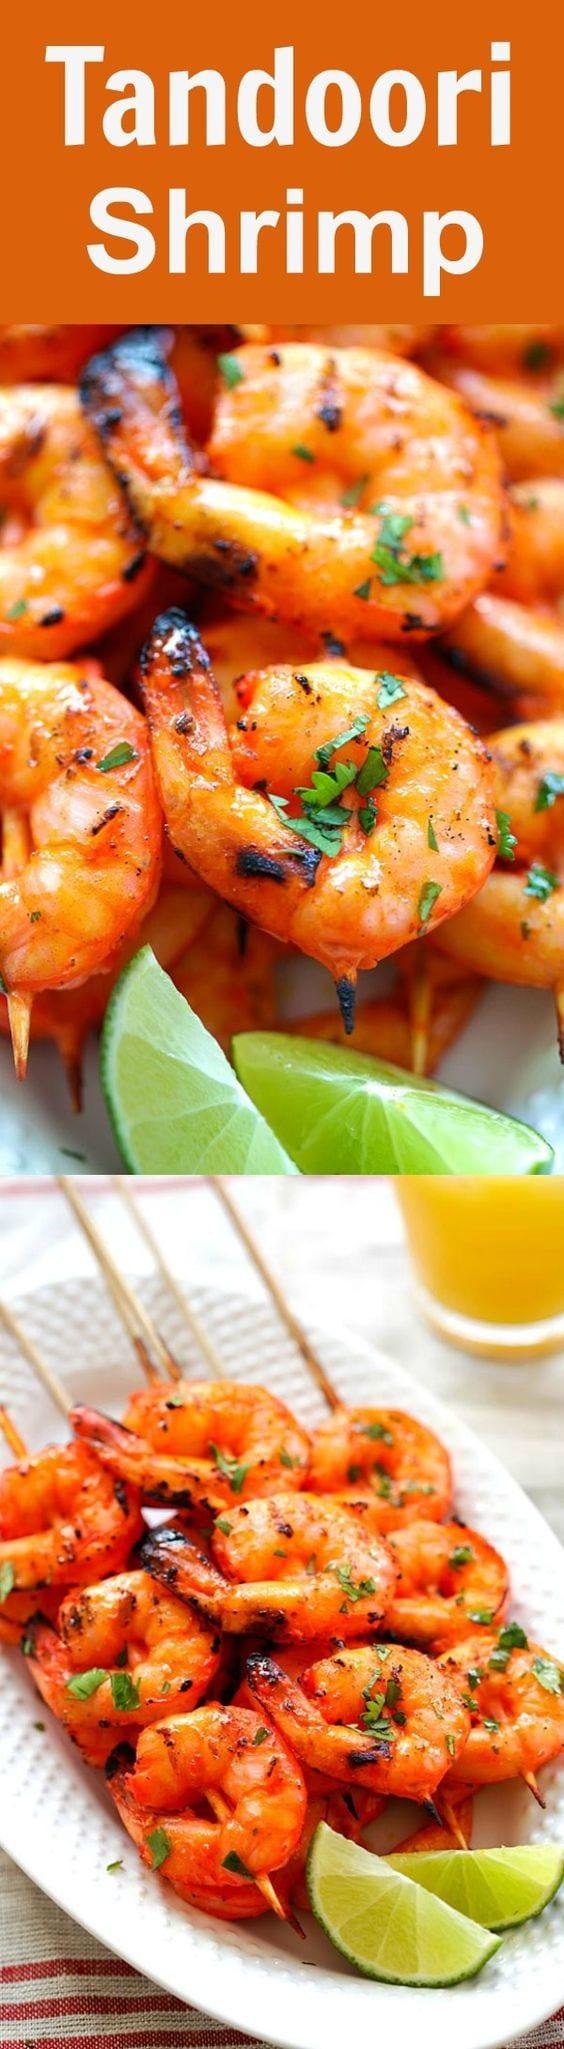 Tandoori Shrimp Recipe  thespruceeatscom